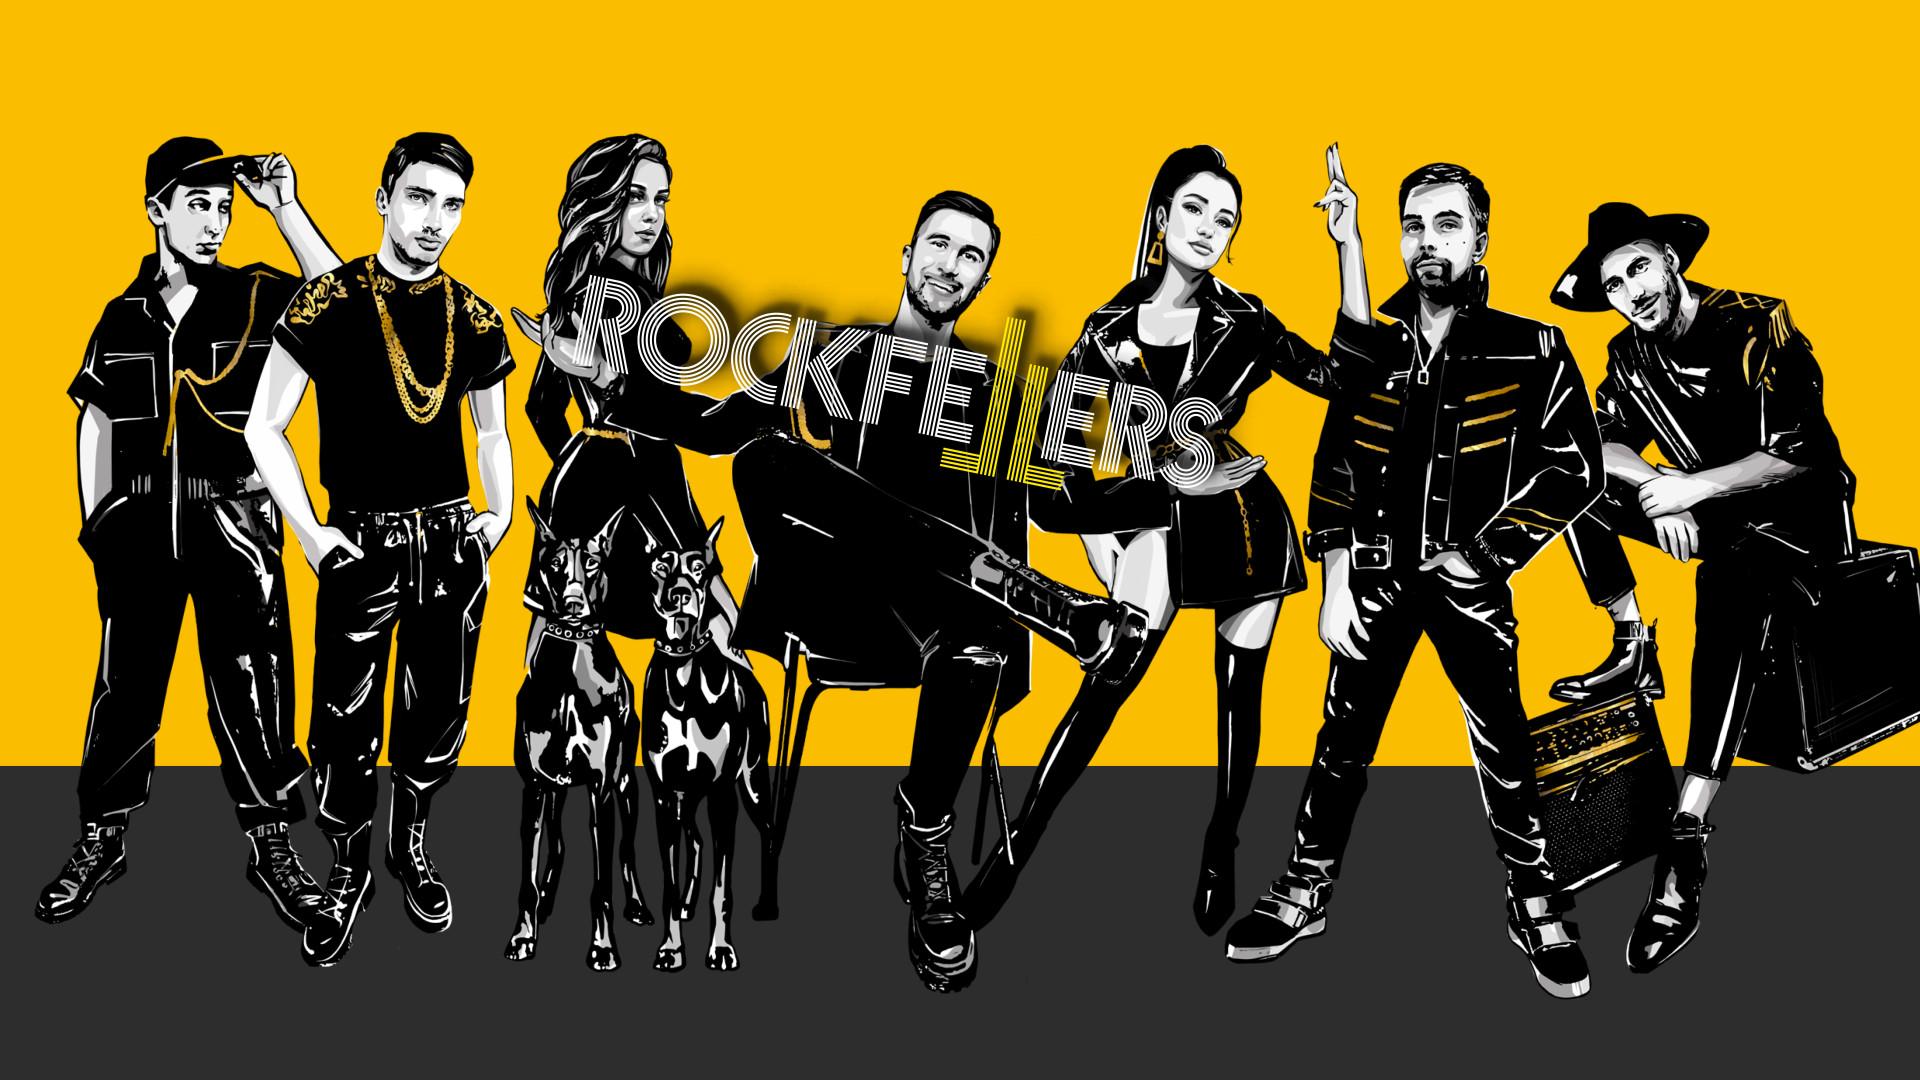 RockFellers